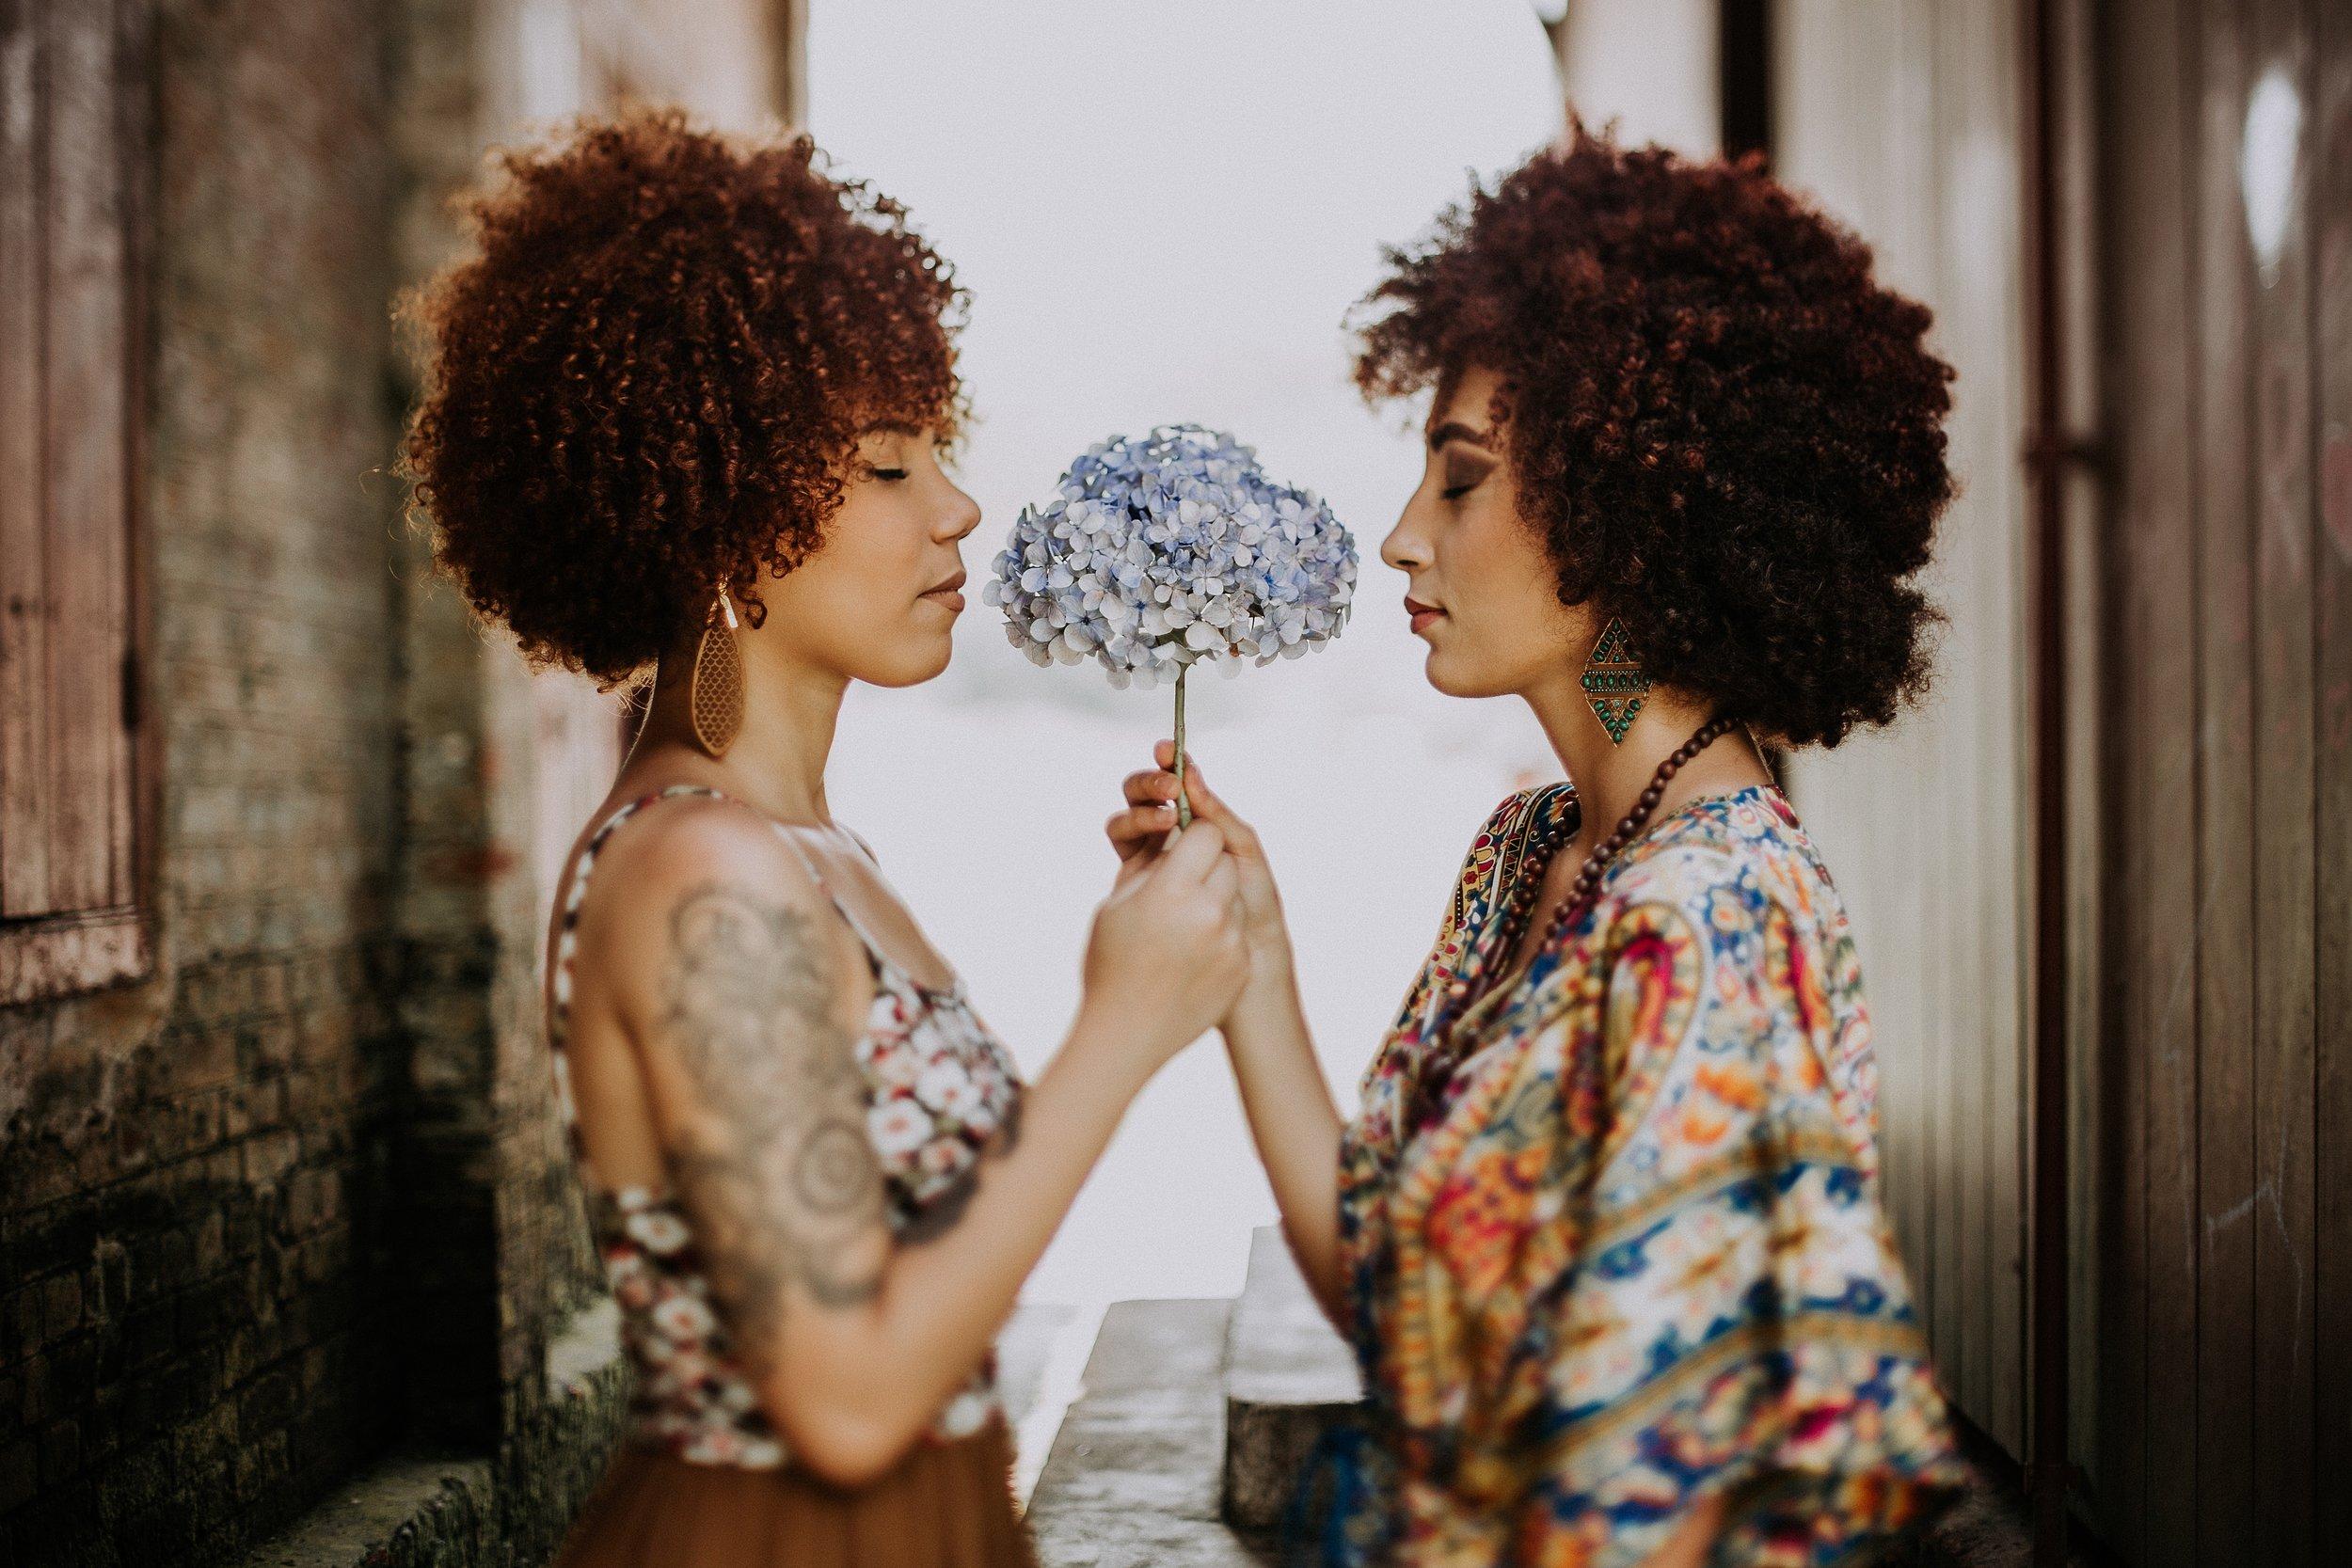 afro-beautiful-fashion-573317.jpg